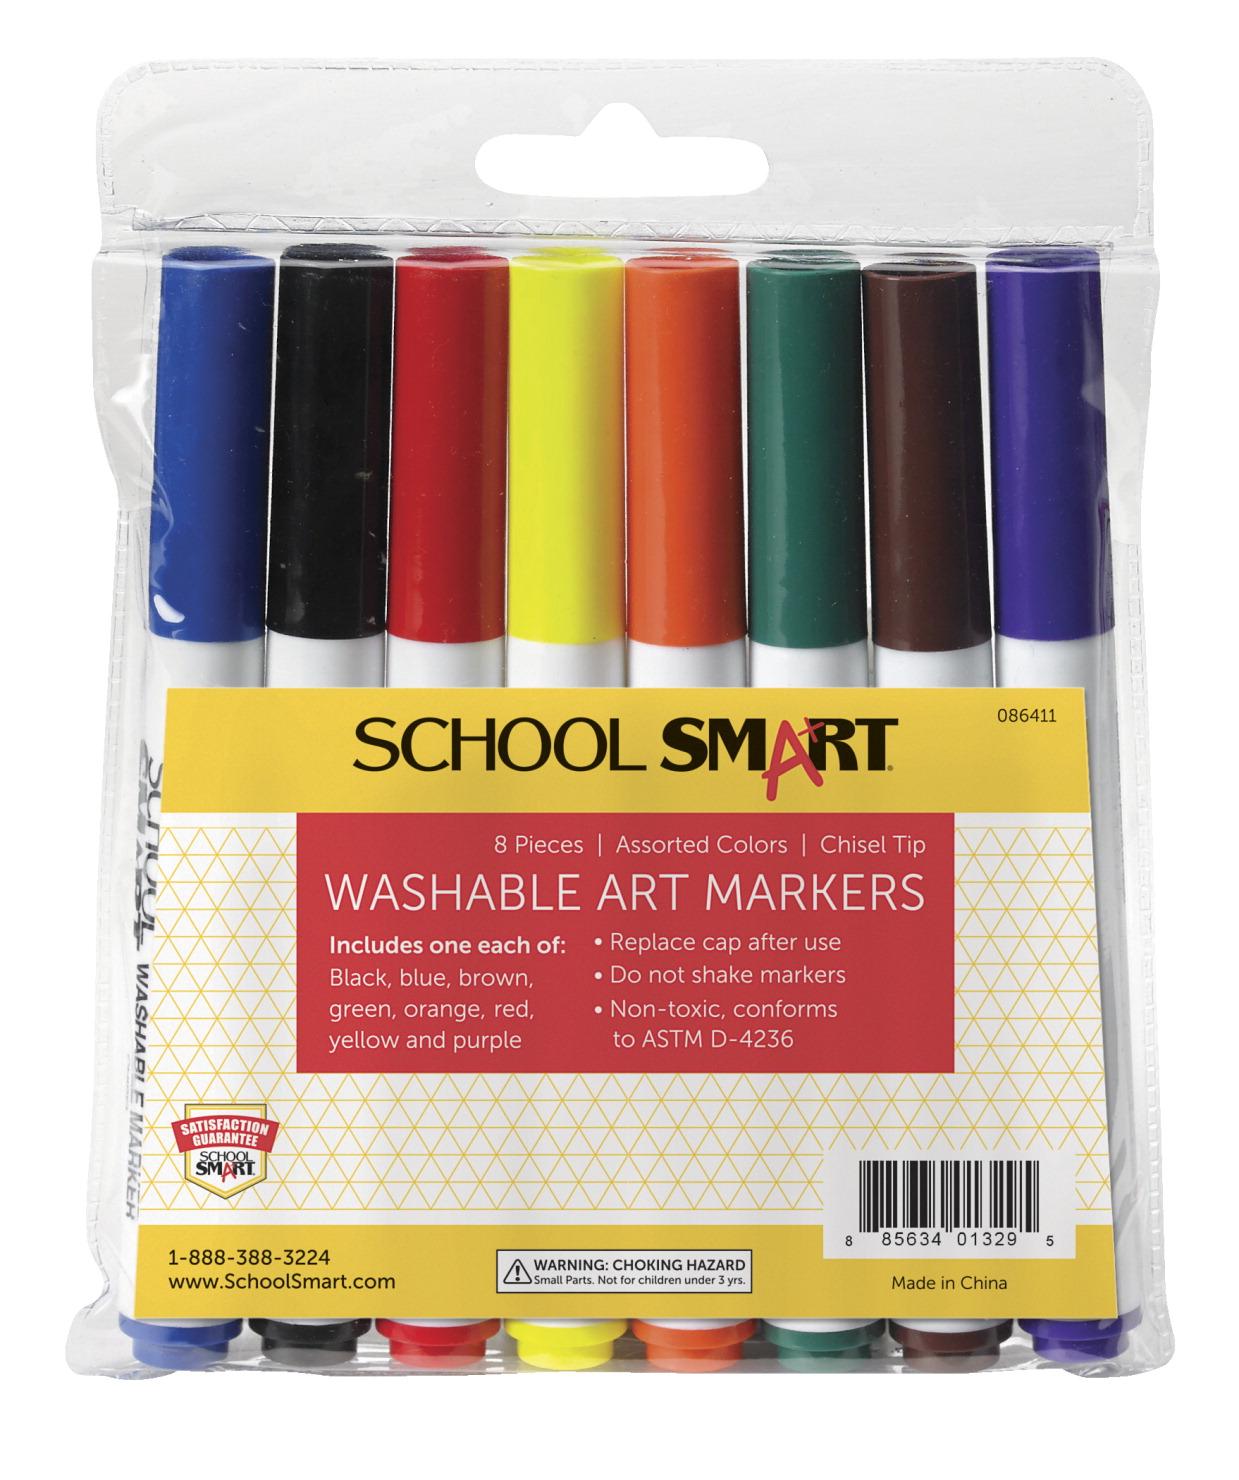 School Smart Quick Dry Washable Marker, Assorted Colors - SOAR Life ...